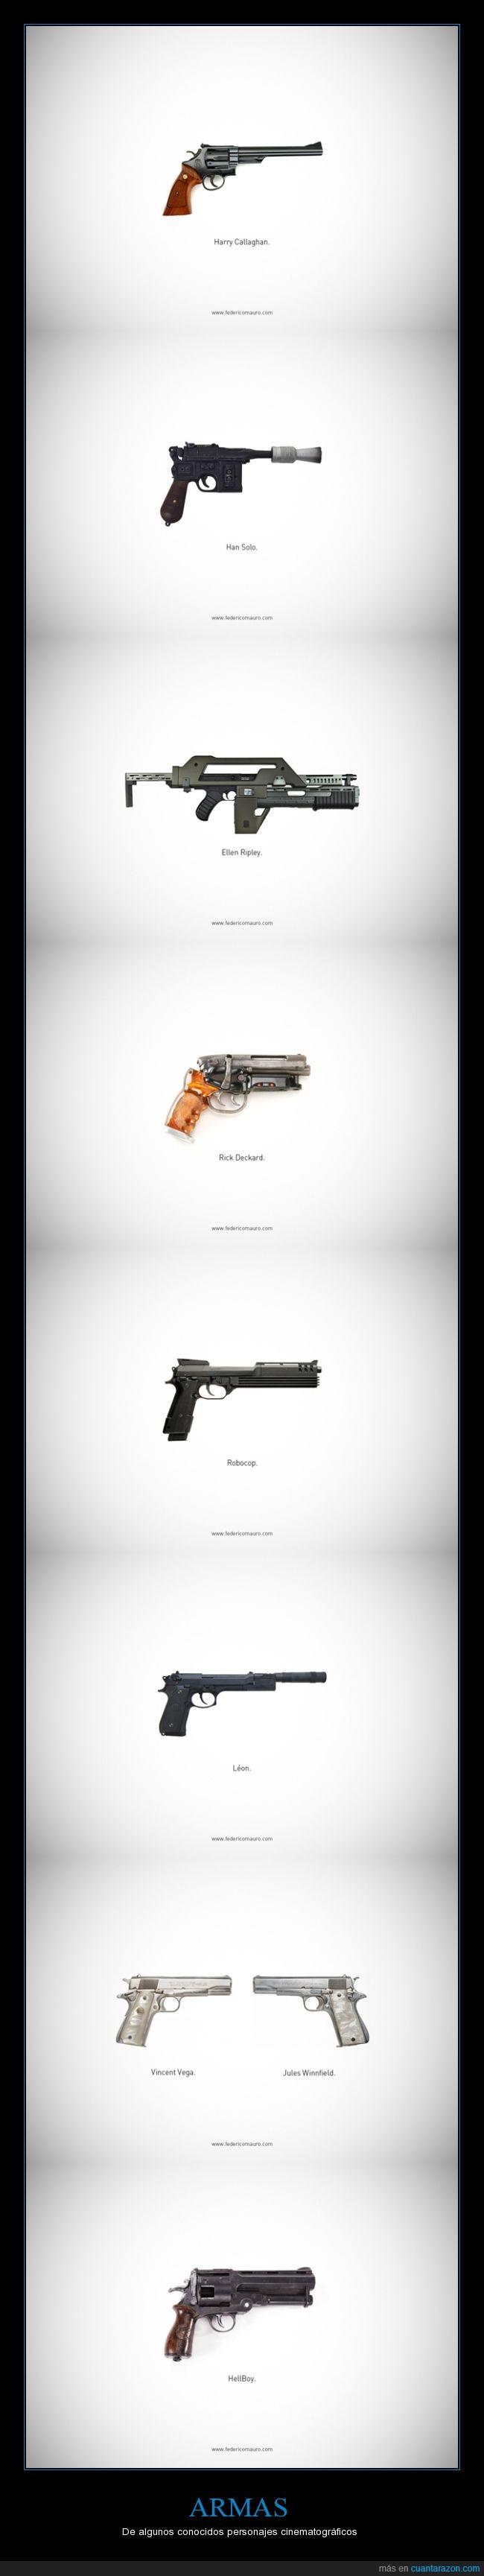 armas,Ellen Ripley,famosos,Han Solo,Harry Callaghan,Hellboy,Jules Winfield,leon,pistolas,Rick Deckard,Robocop,Vincent Vega